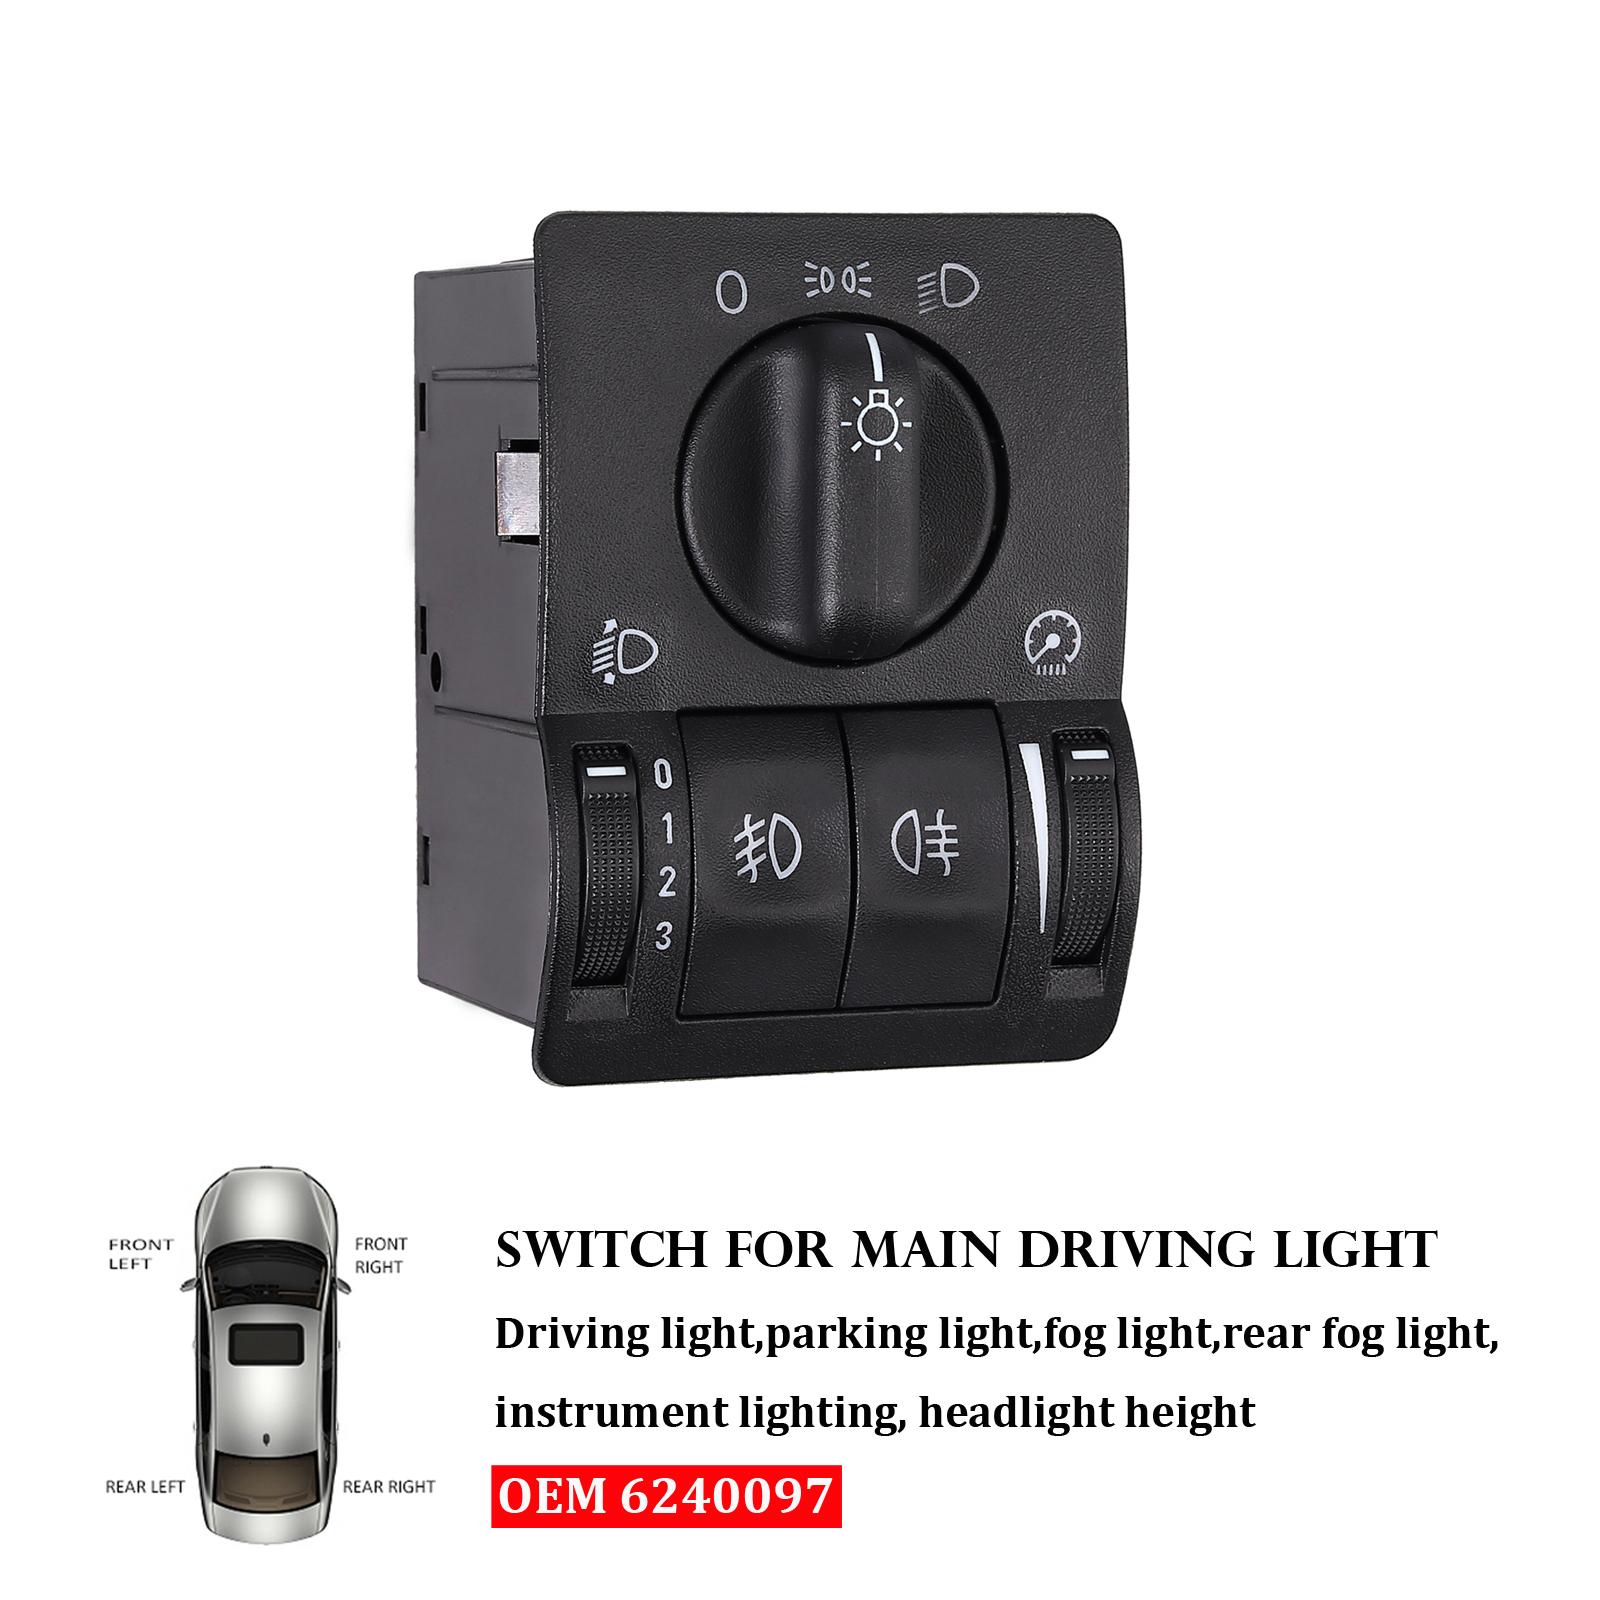 VAUXHALL ASTRA G 90437440 LIGHT SWITCH KNOB MAIN LIGHT SWITCH FOR OPEL